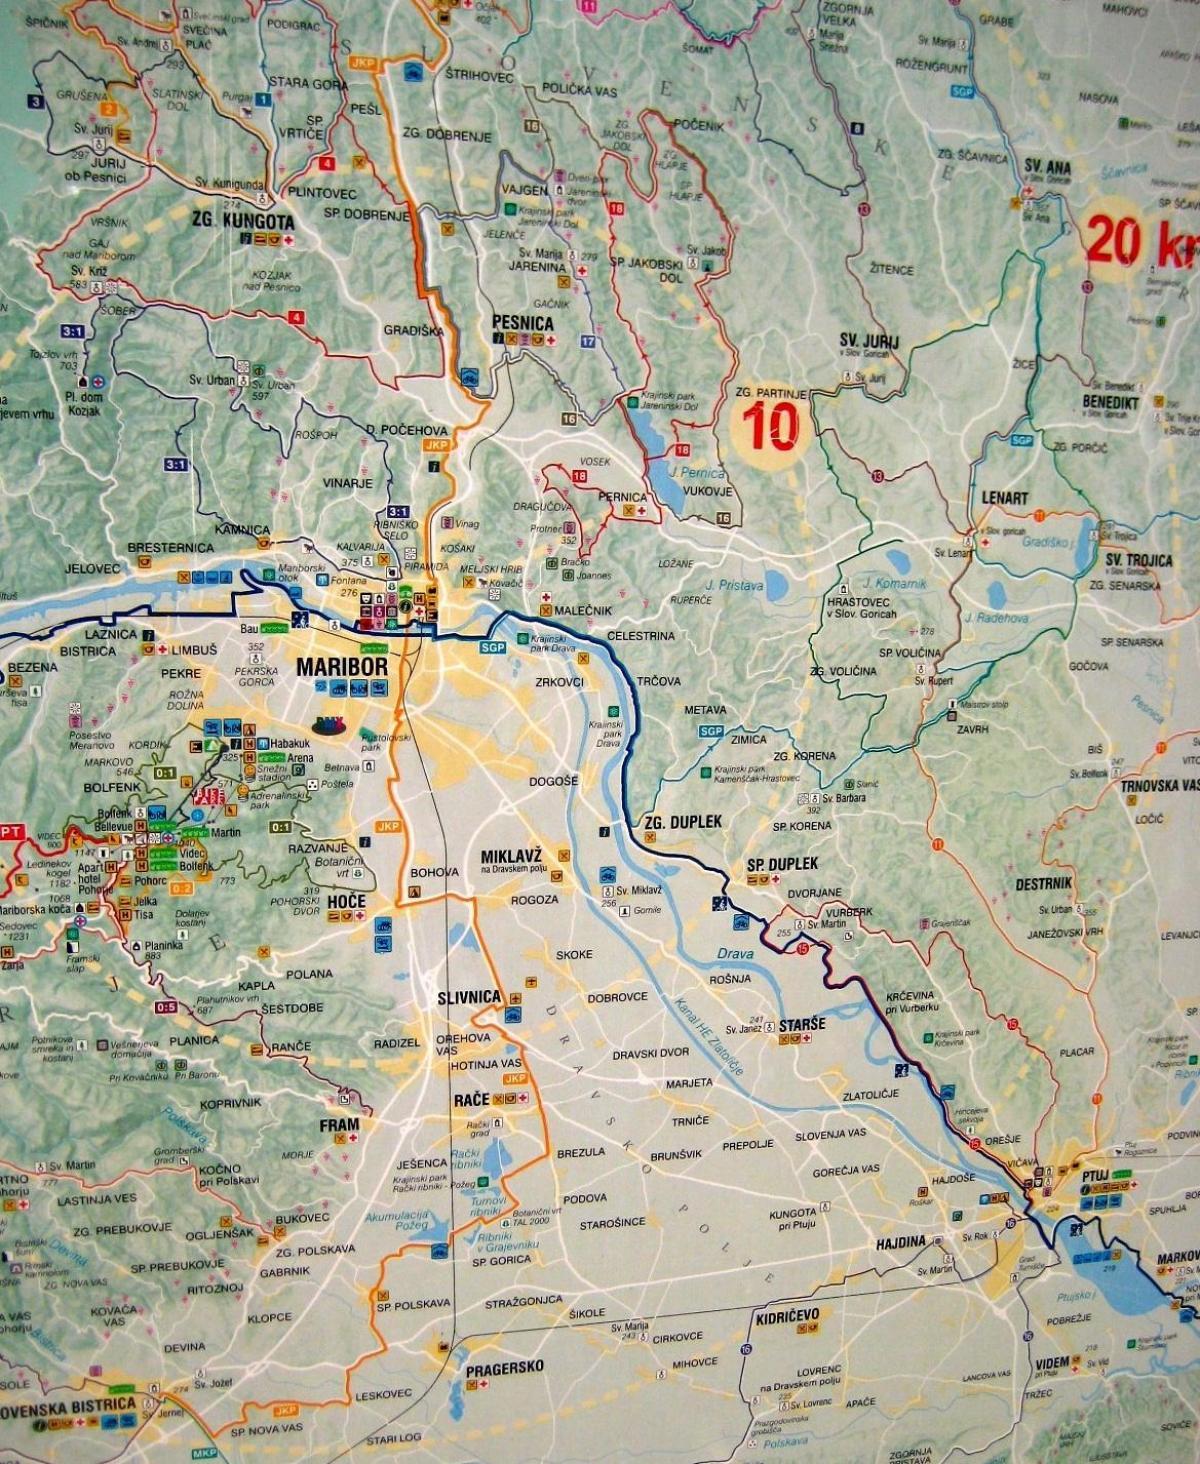 Camping Slovenien Kort Kort Over Camping I Slovenien Det